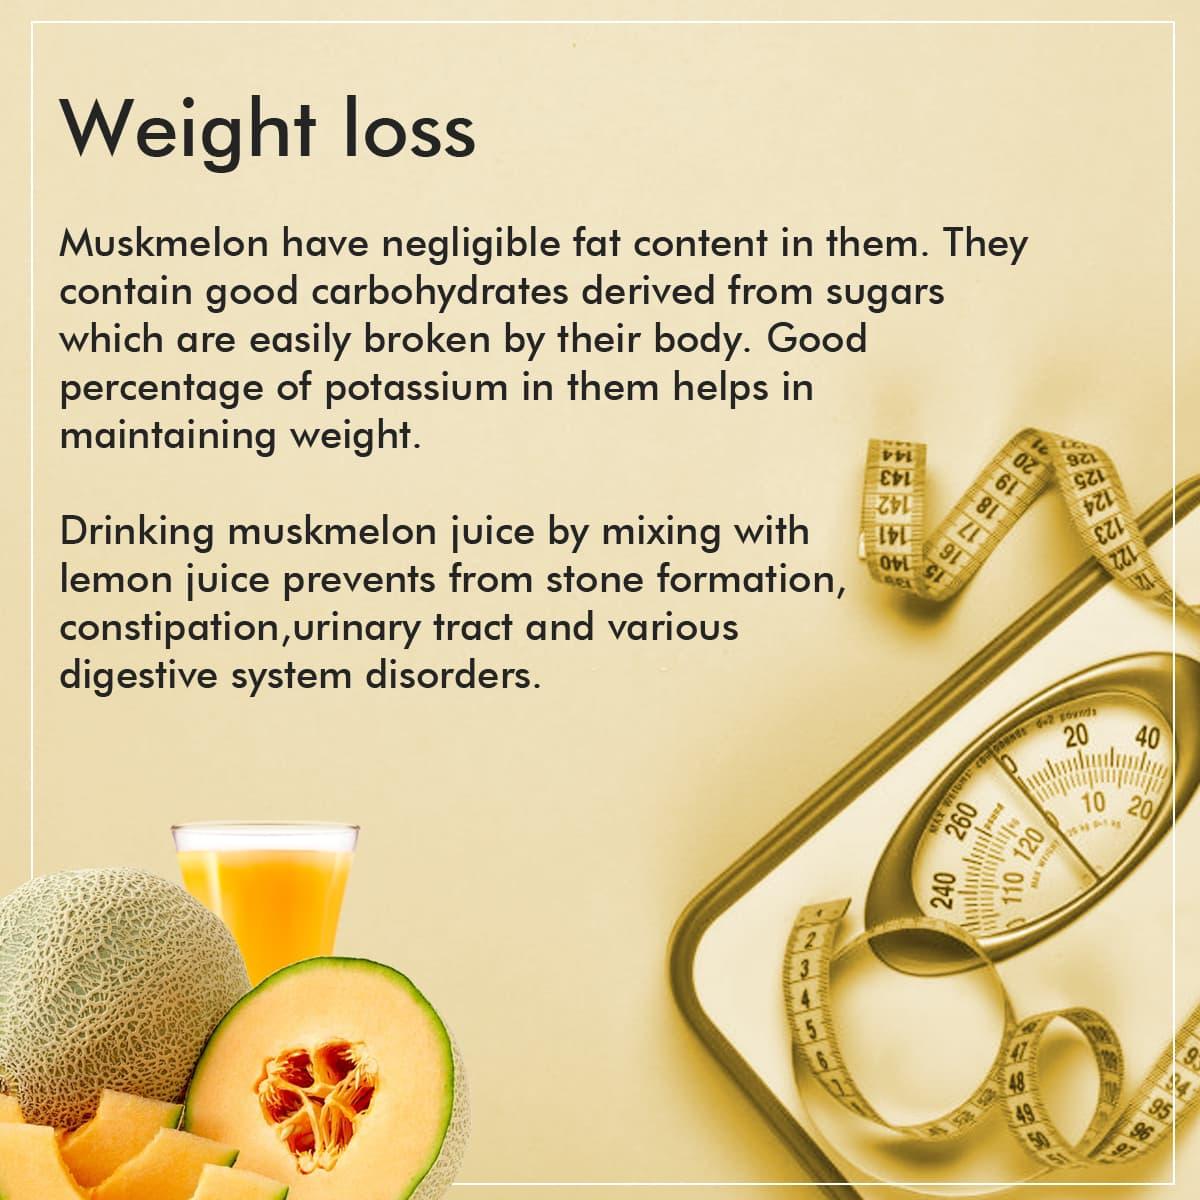 Muskmelon Juice Powder Nattfru Protein quality for melons, cantaloupe, raw includes usda commodity food a415. muskmelon juice powder